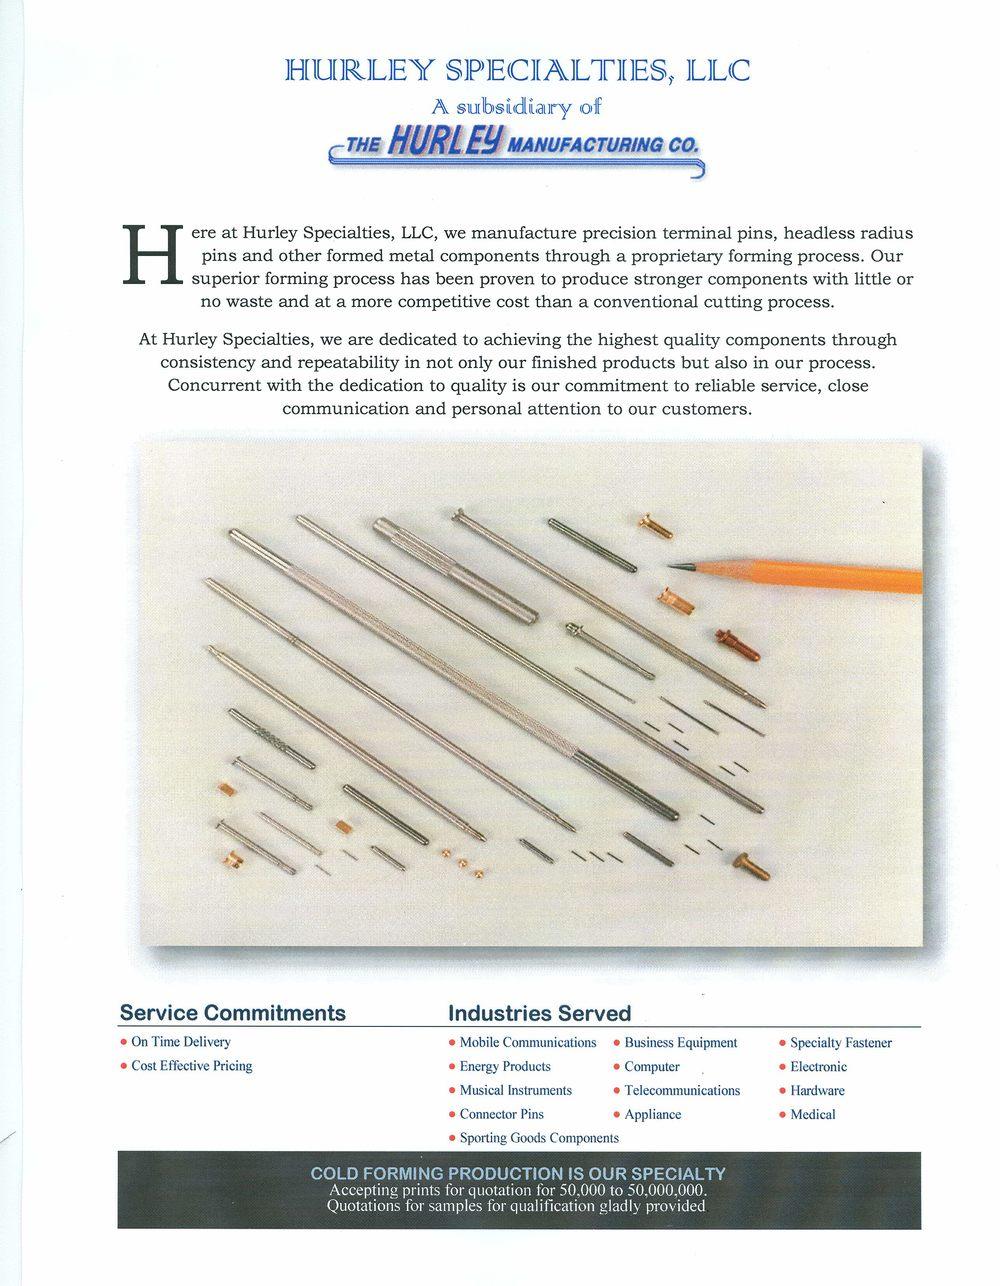 Hurley Specialties Flyer_Page_1.jpg